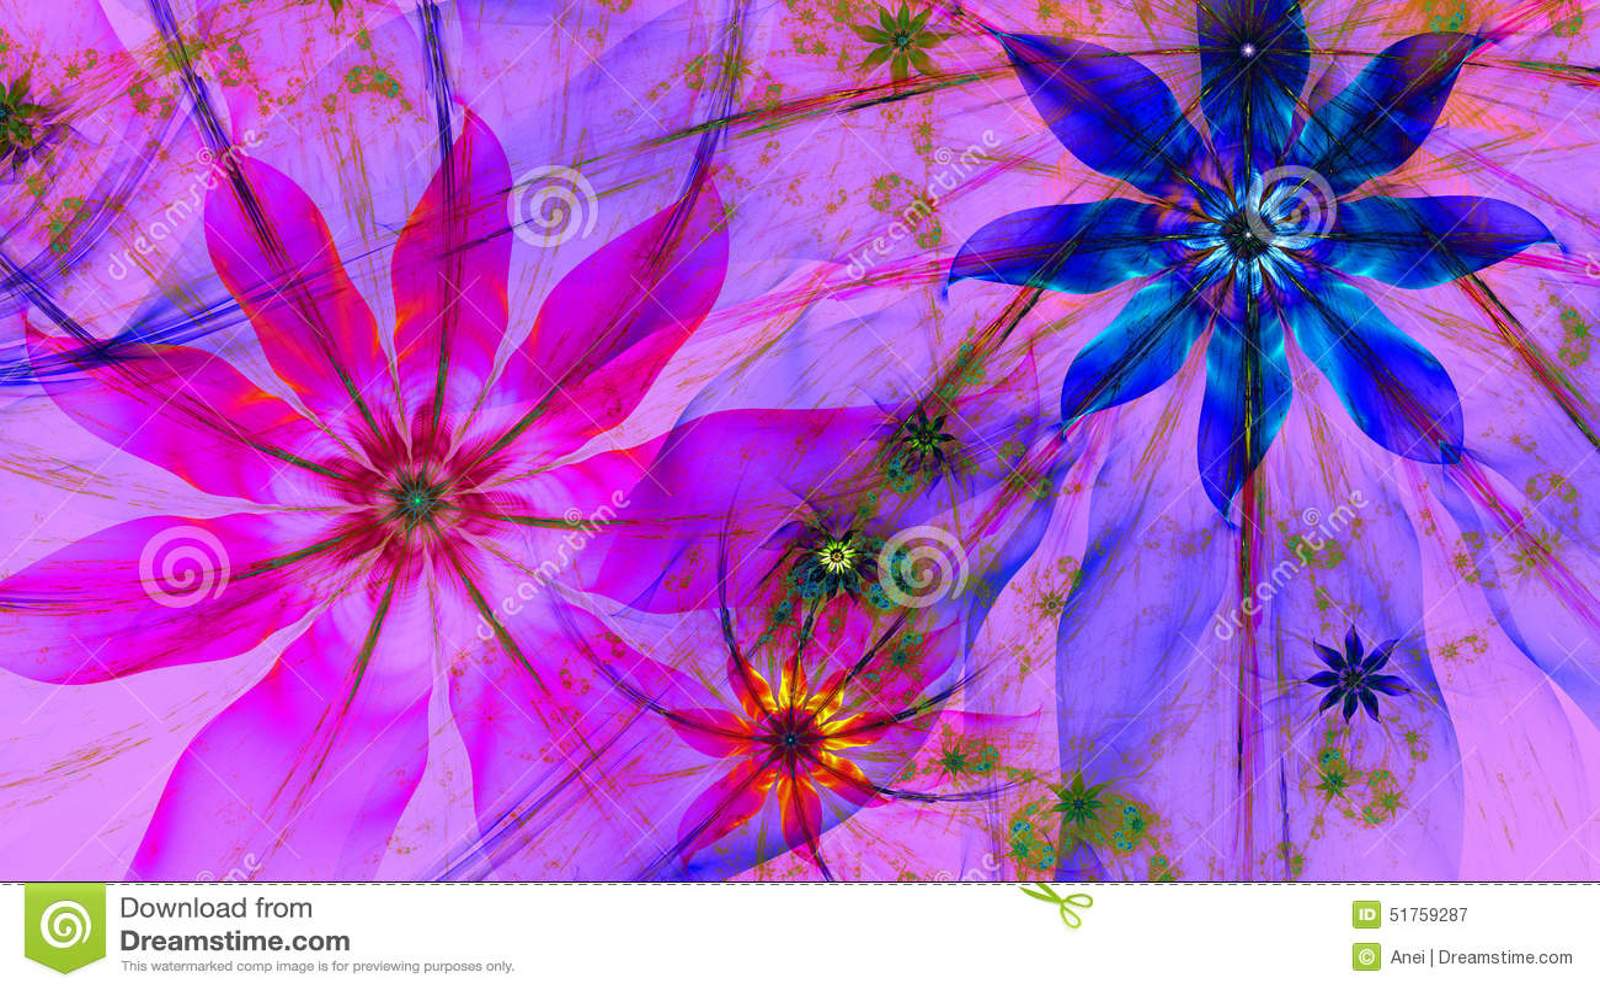 Bright Colors Wallpaper 3d Beautiful Dark Vivid Glowing Modern Flower Background In